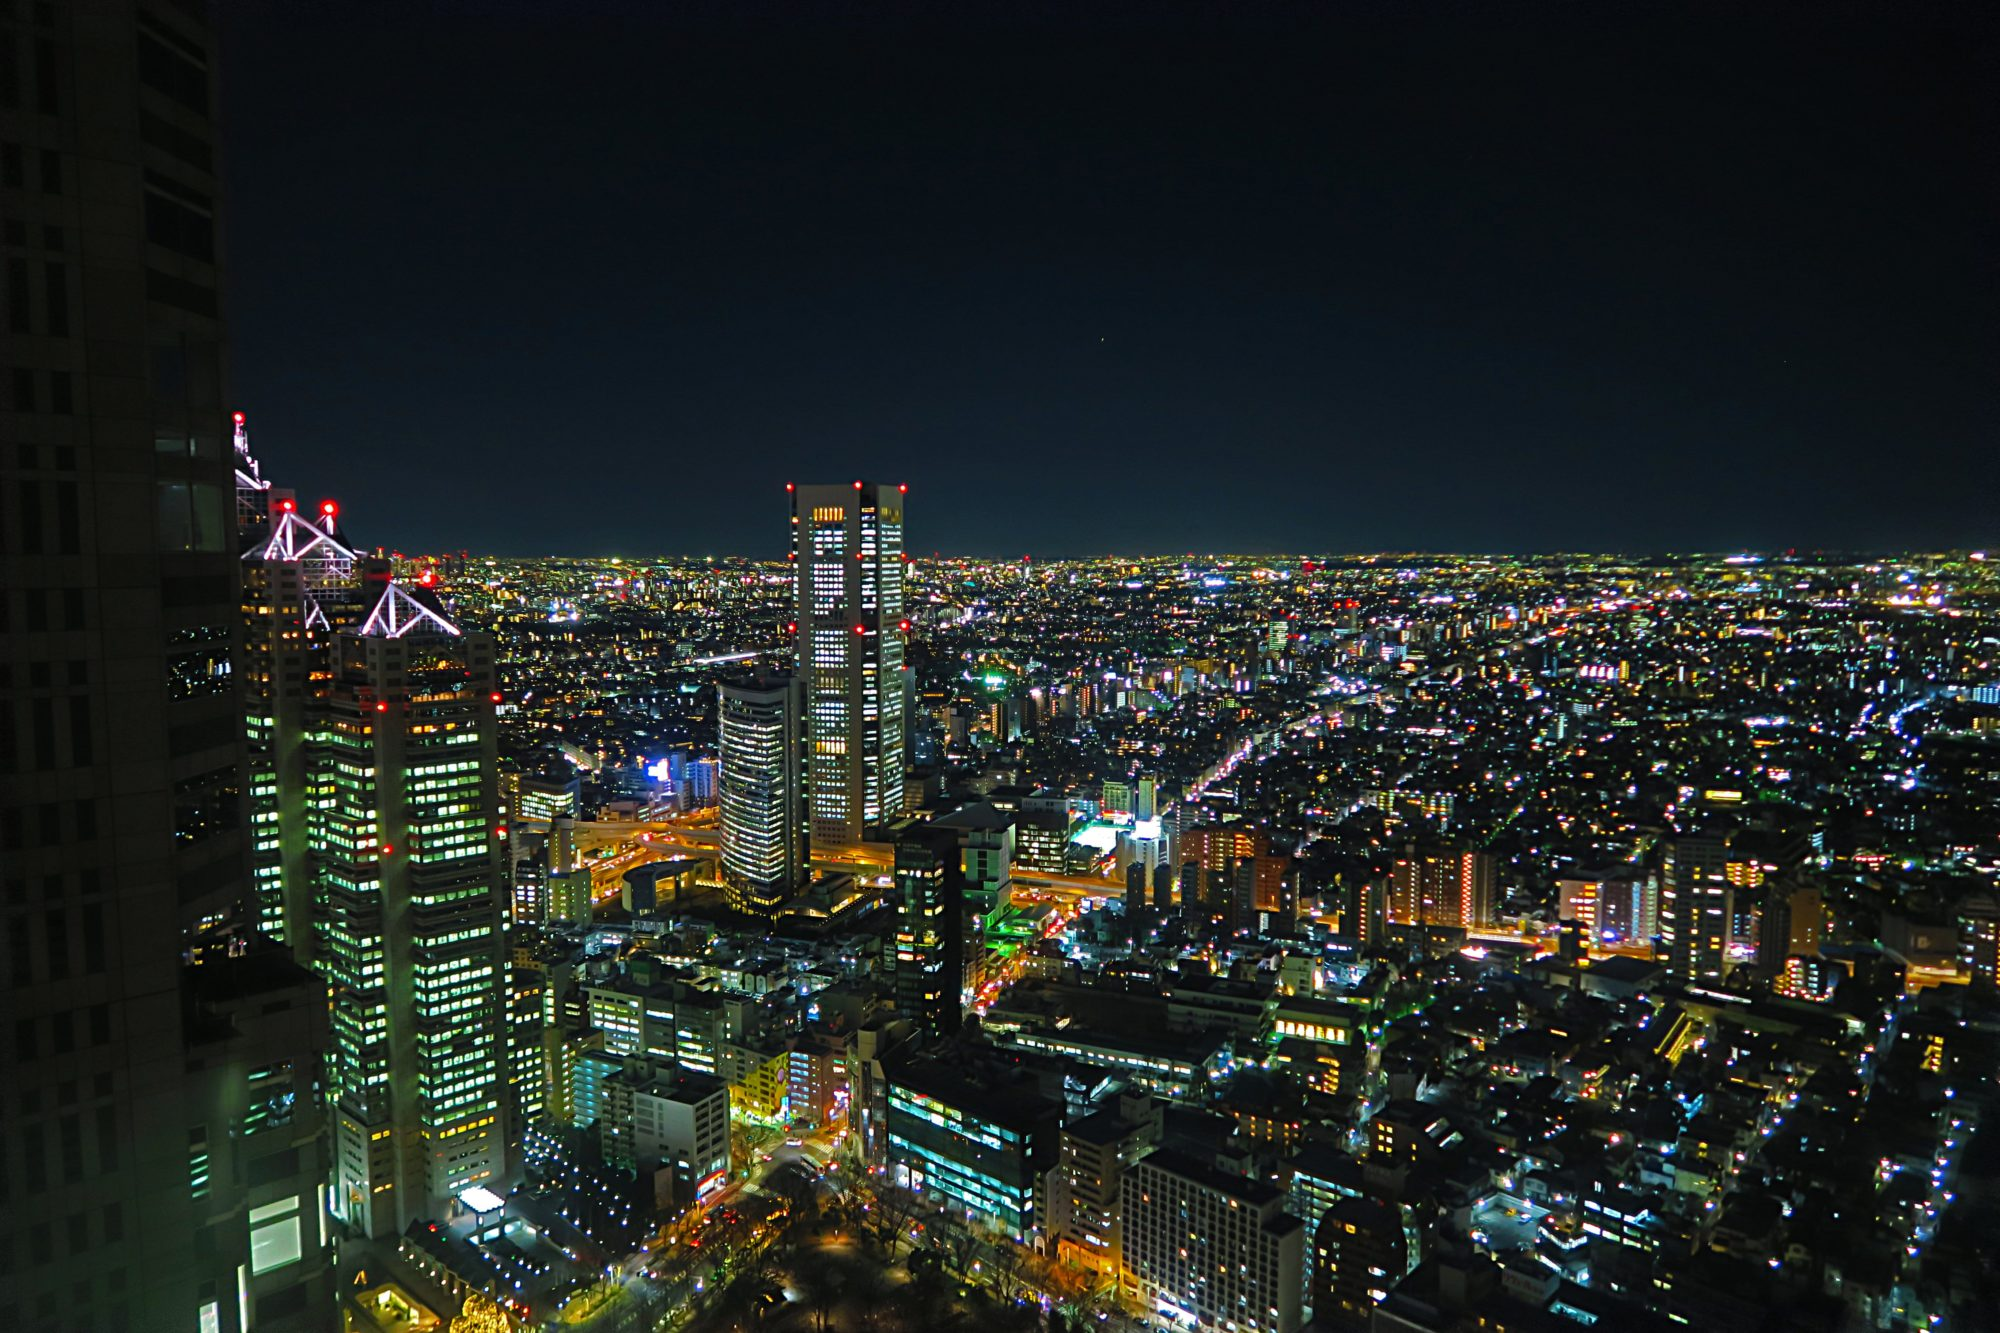 japan_tokyo_shinjuku_tocho, sehenswuerdigkeit, ausblick